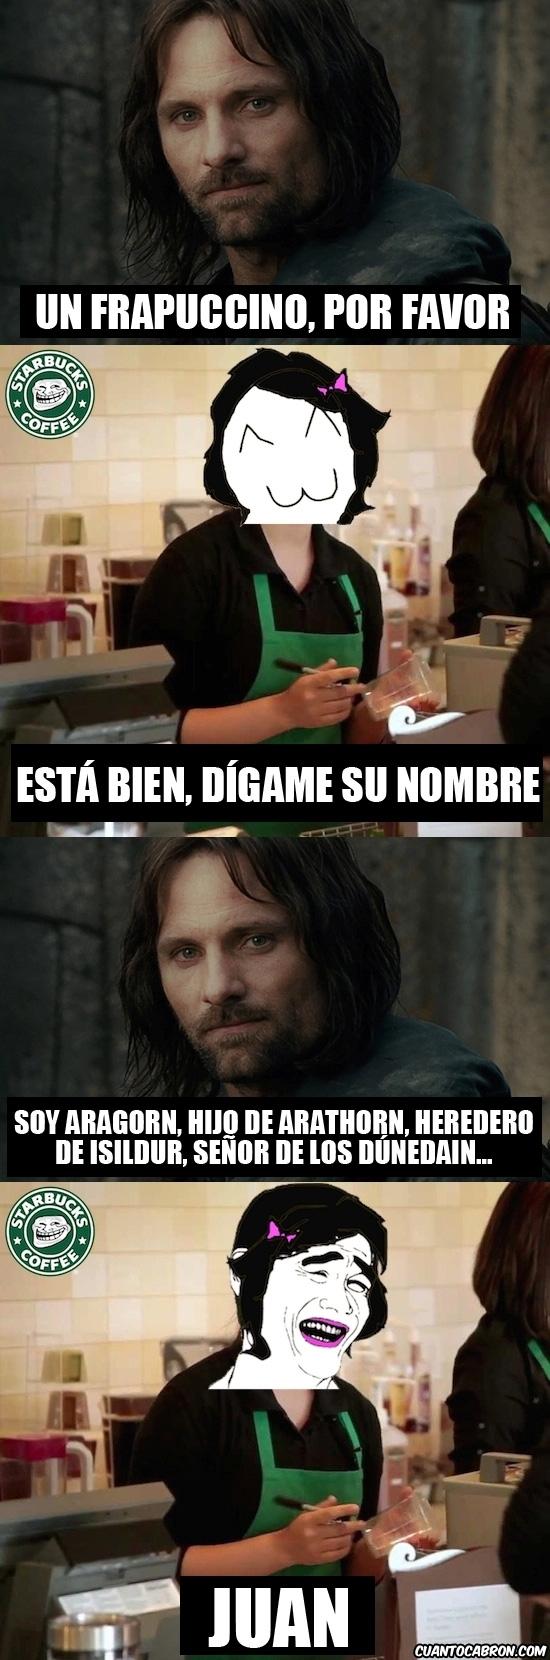 Aragorn,Cafe,Frapuccino,Starbucks coffee,Yao Ming